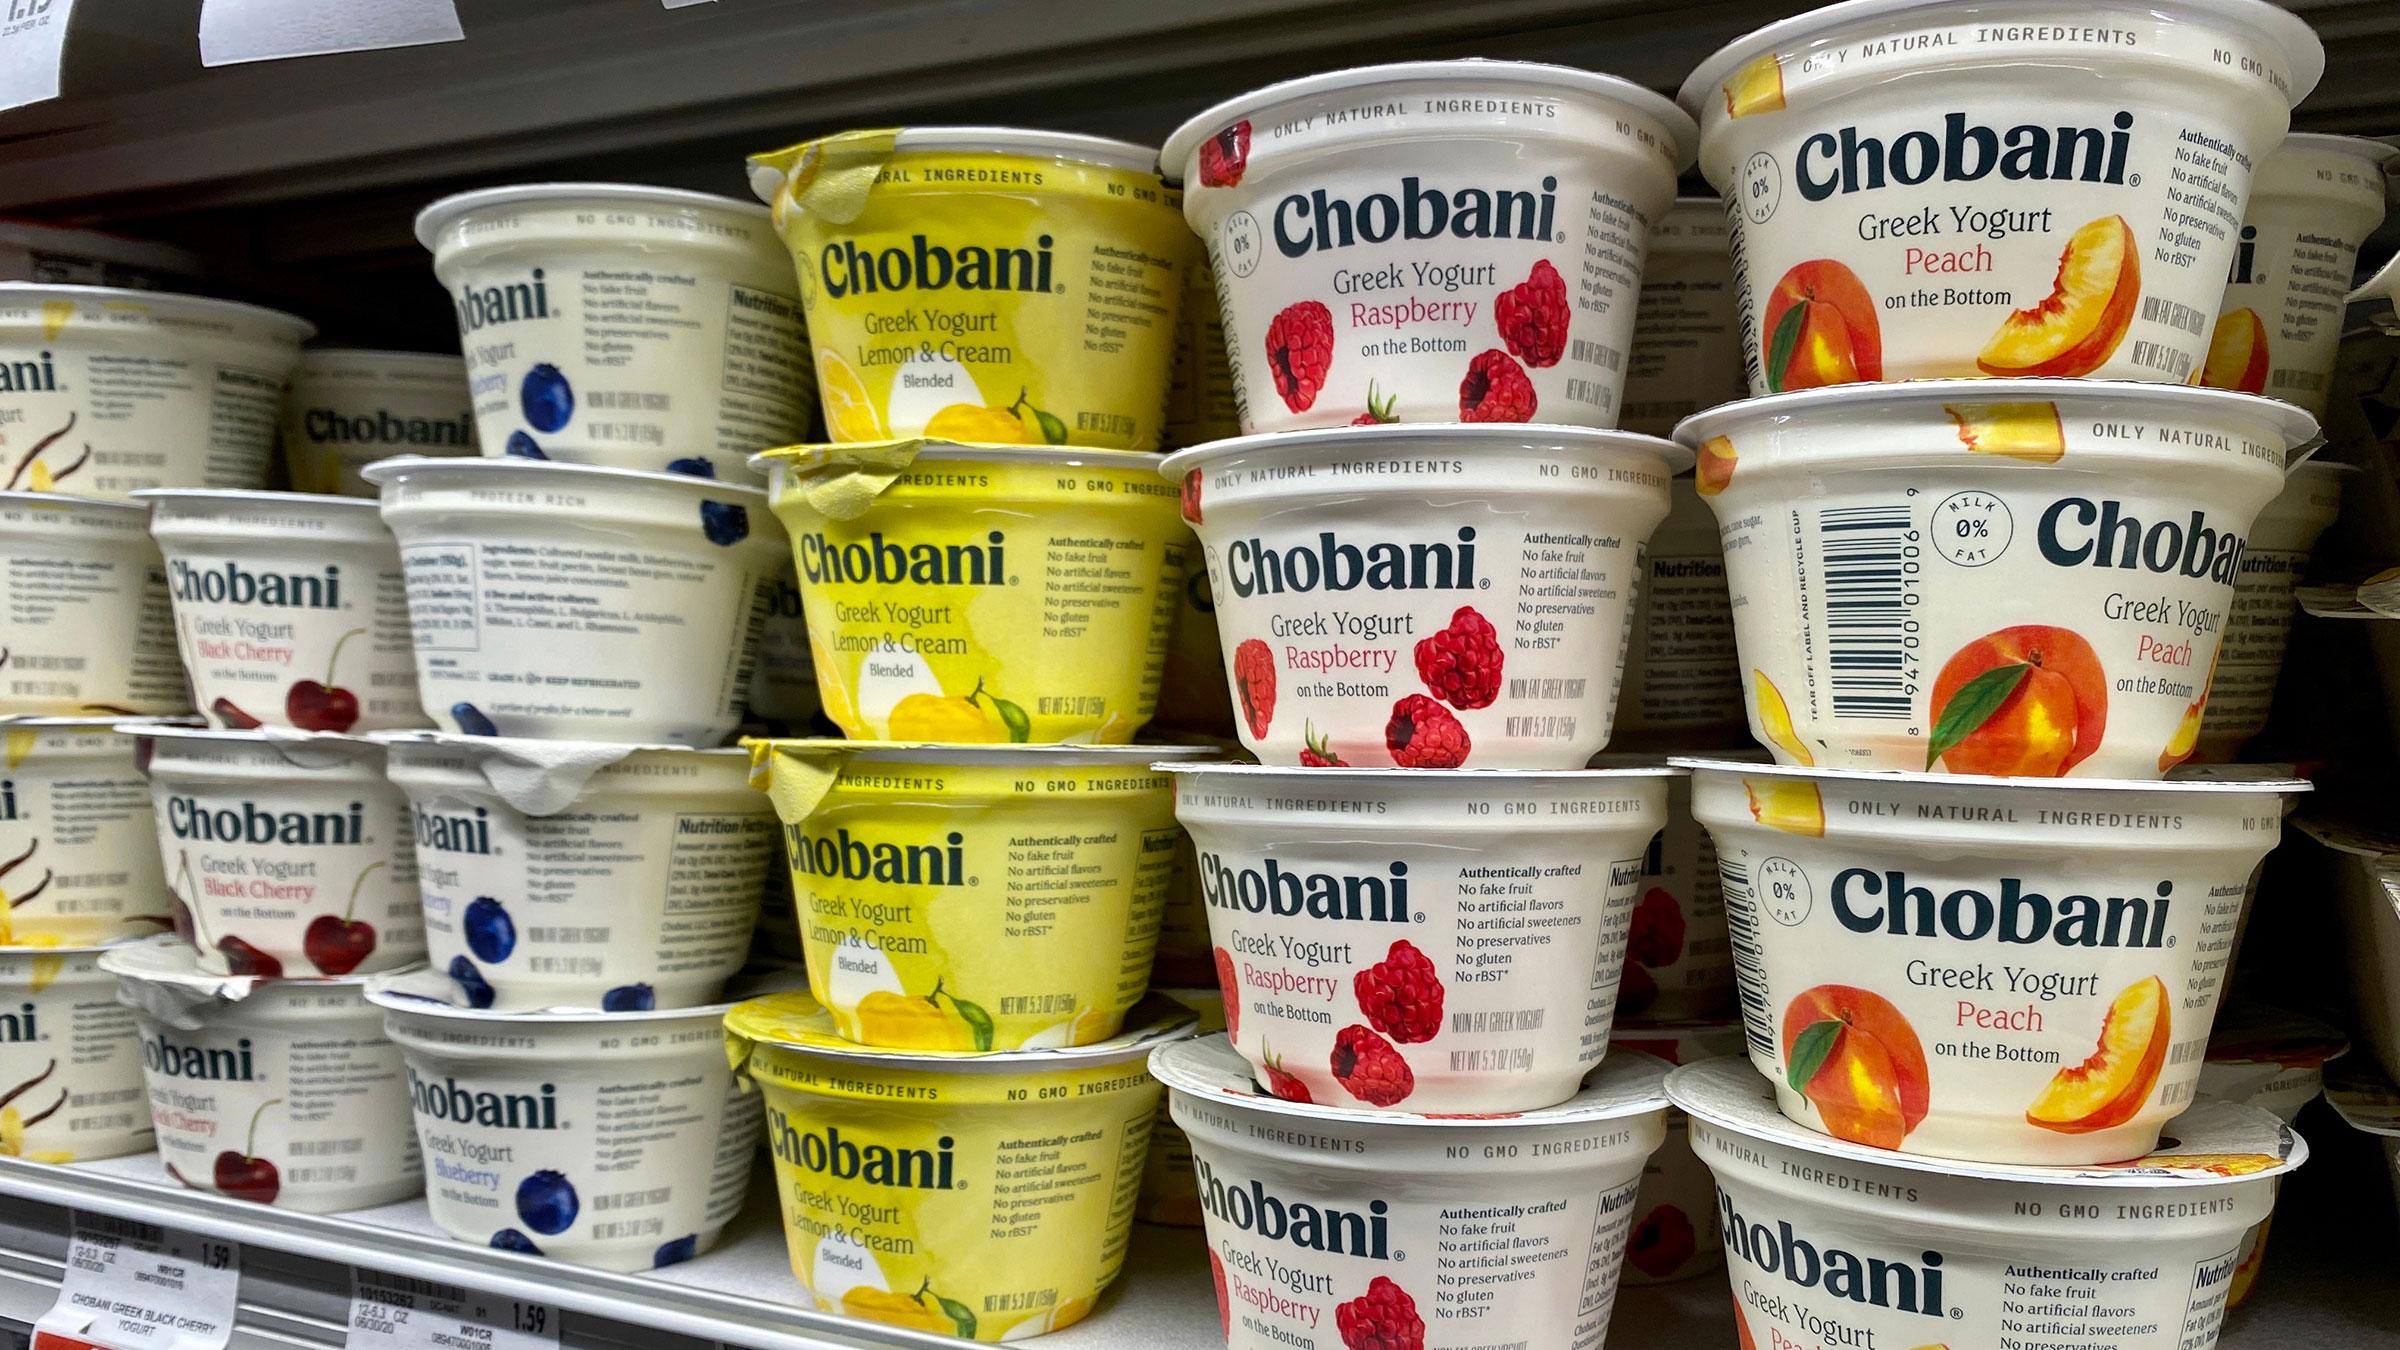 Cups of Chobani greek yogurt sit on a supermarket shelf in San Jose, California.